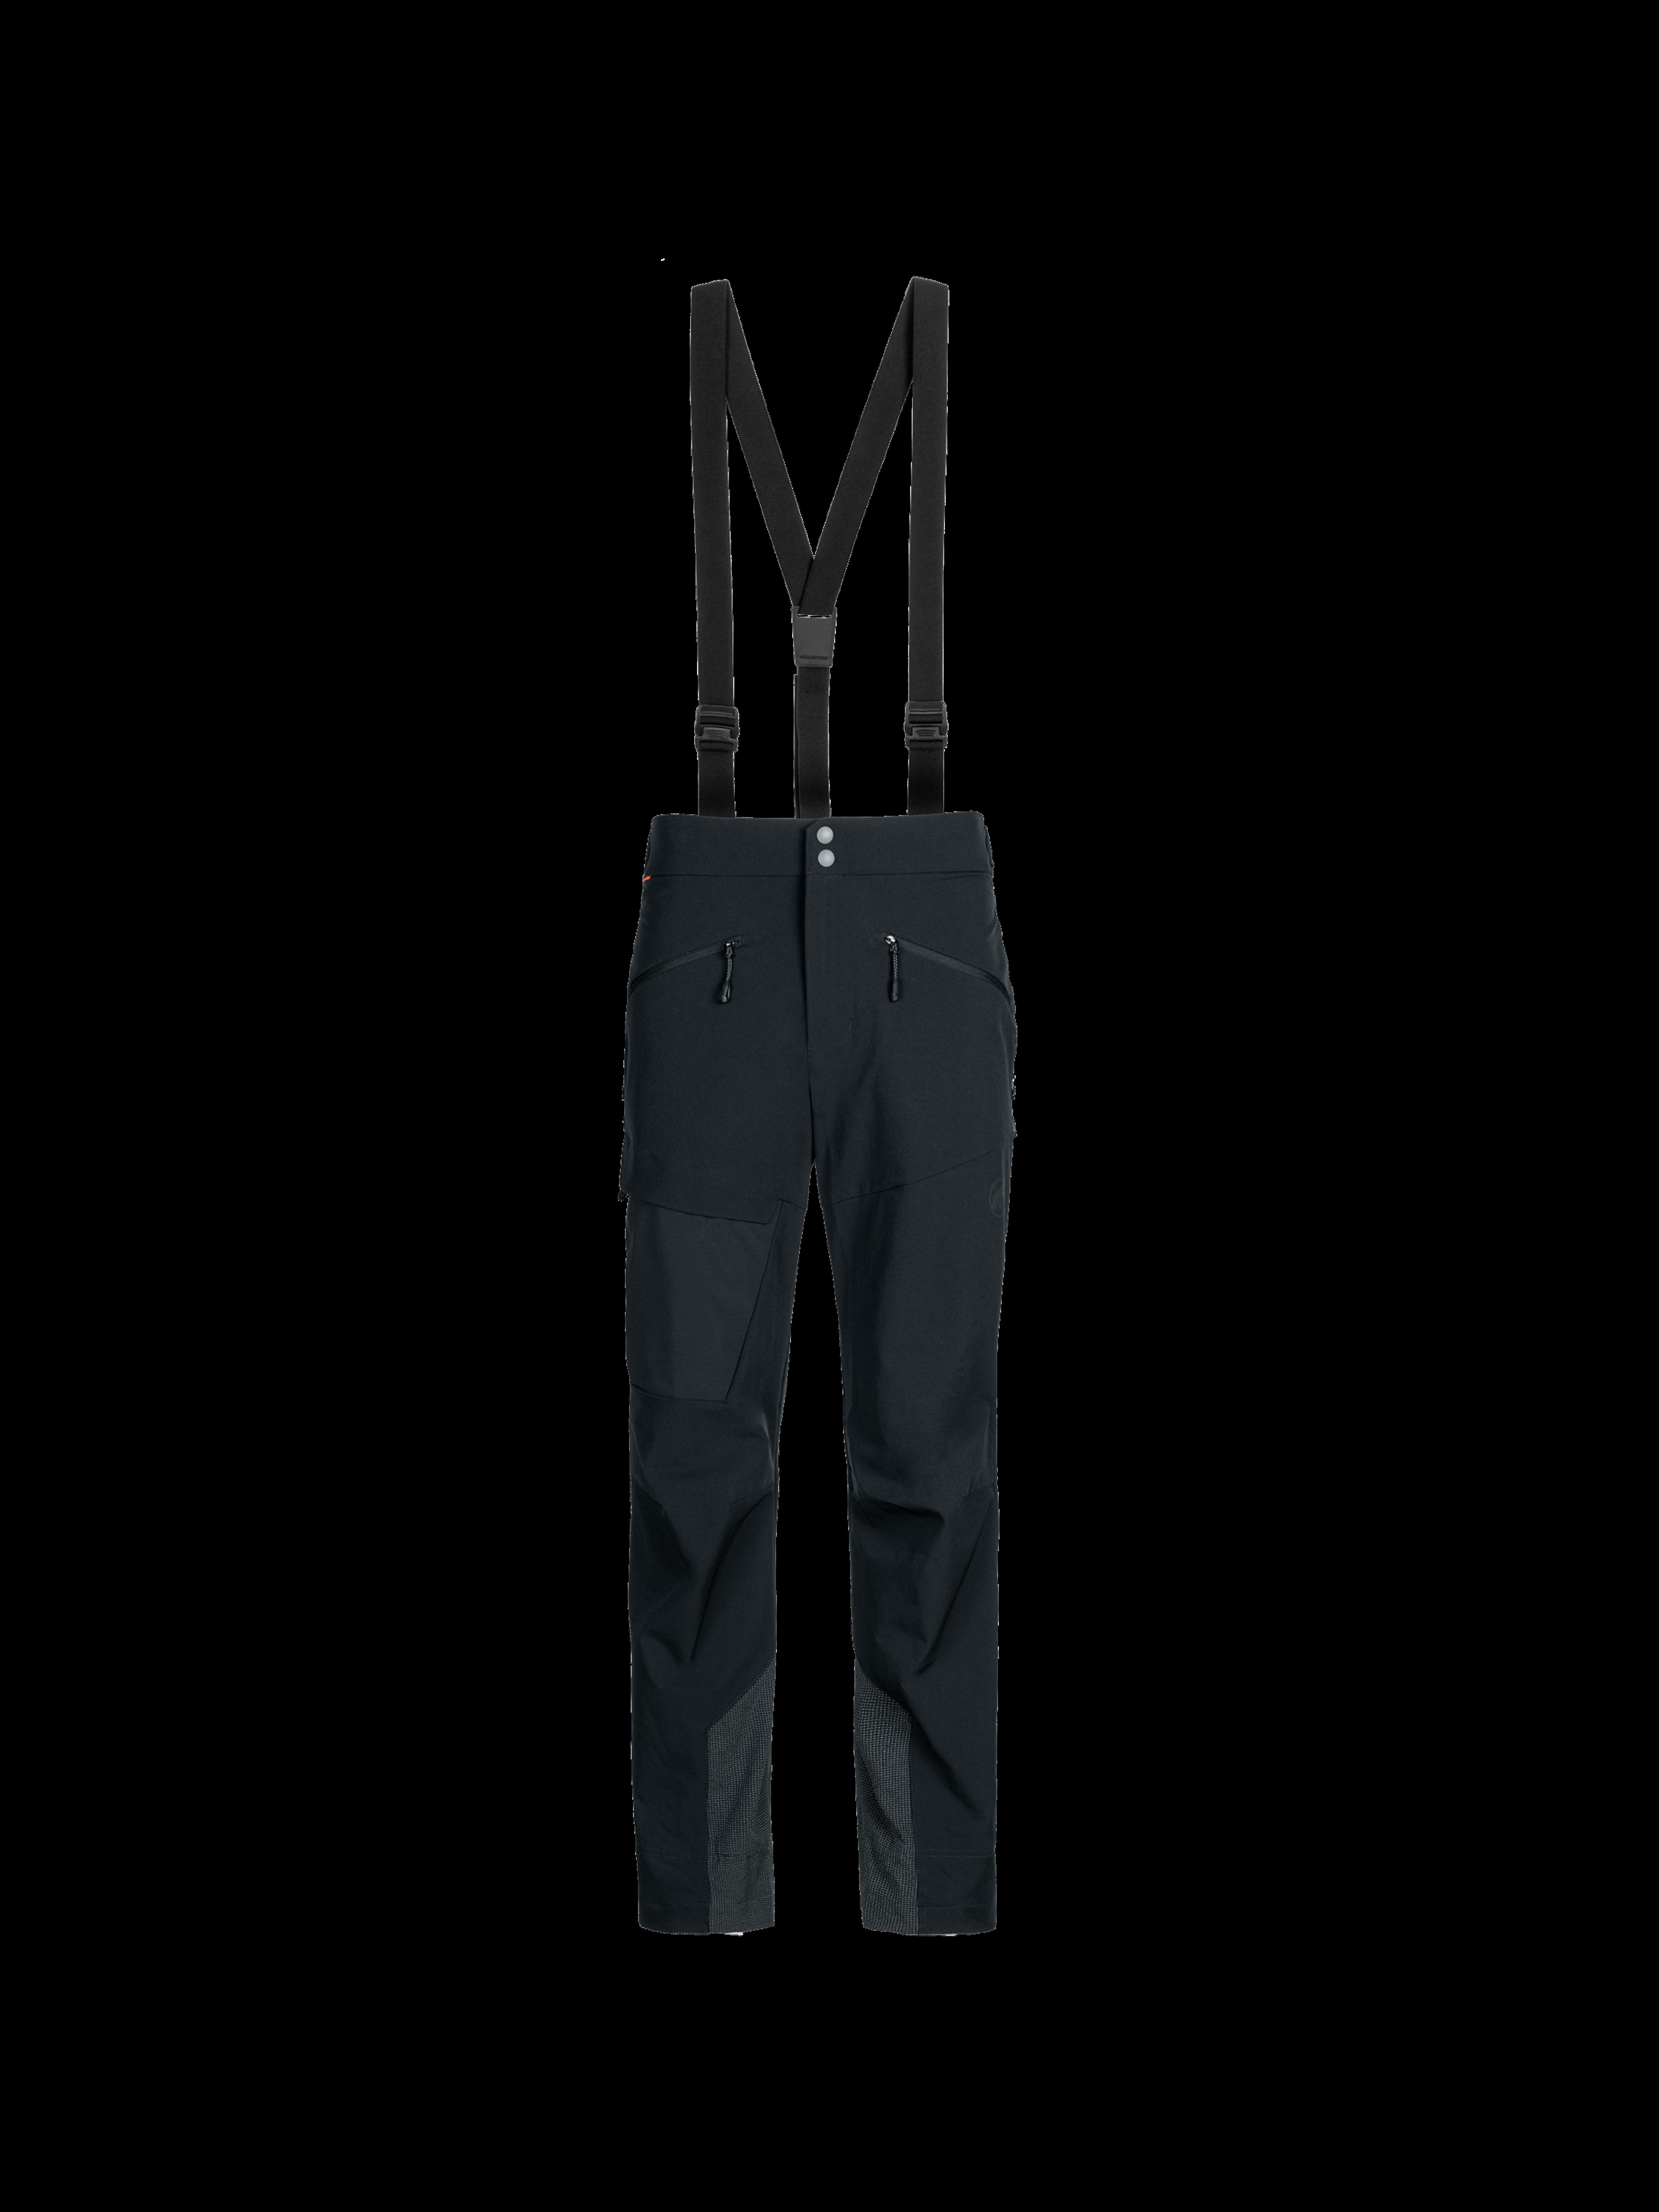 Base Jump SO Touring Pants Men product image